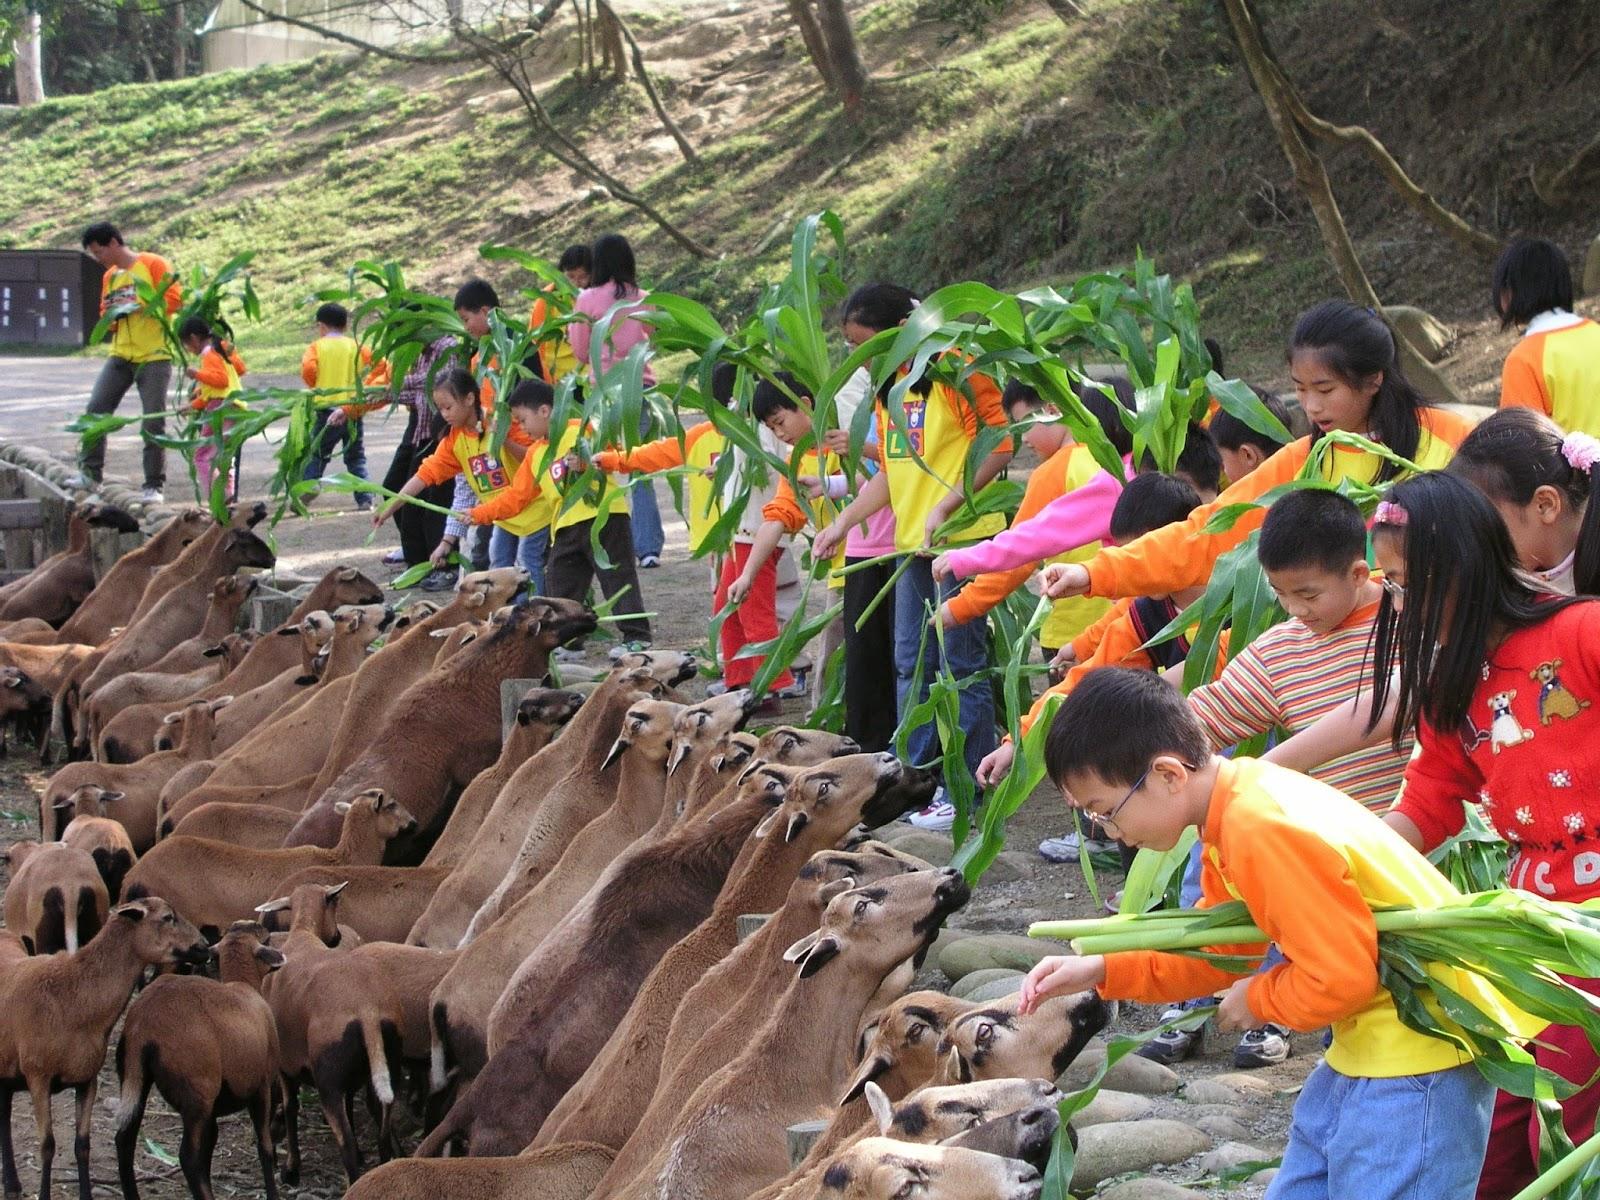 ITF台北國際旅展官方部落格: 飛牛牧場精心包裝【物美價廉】極優質特惠